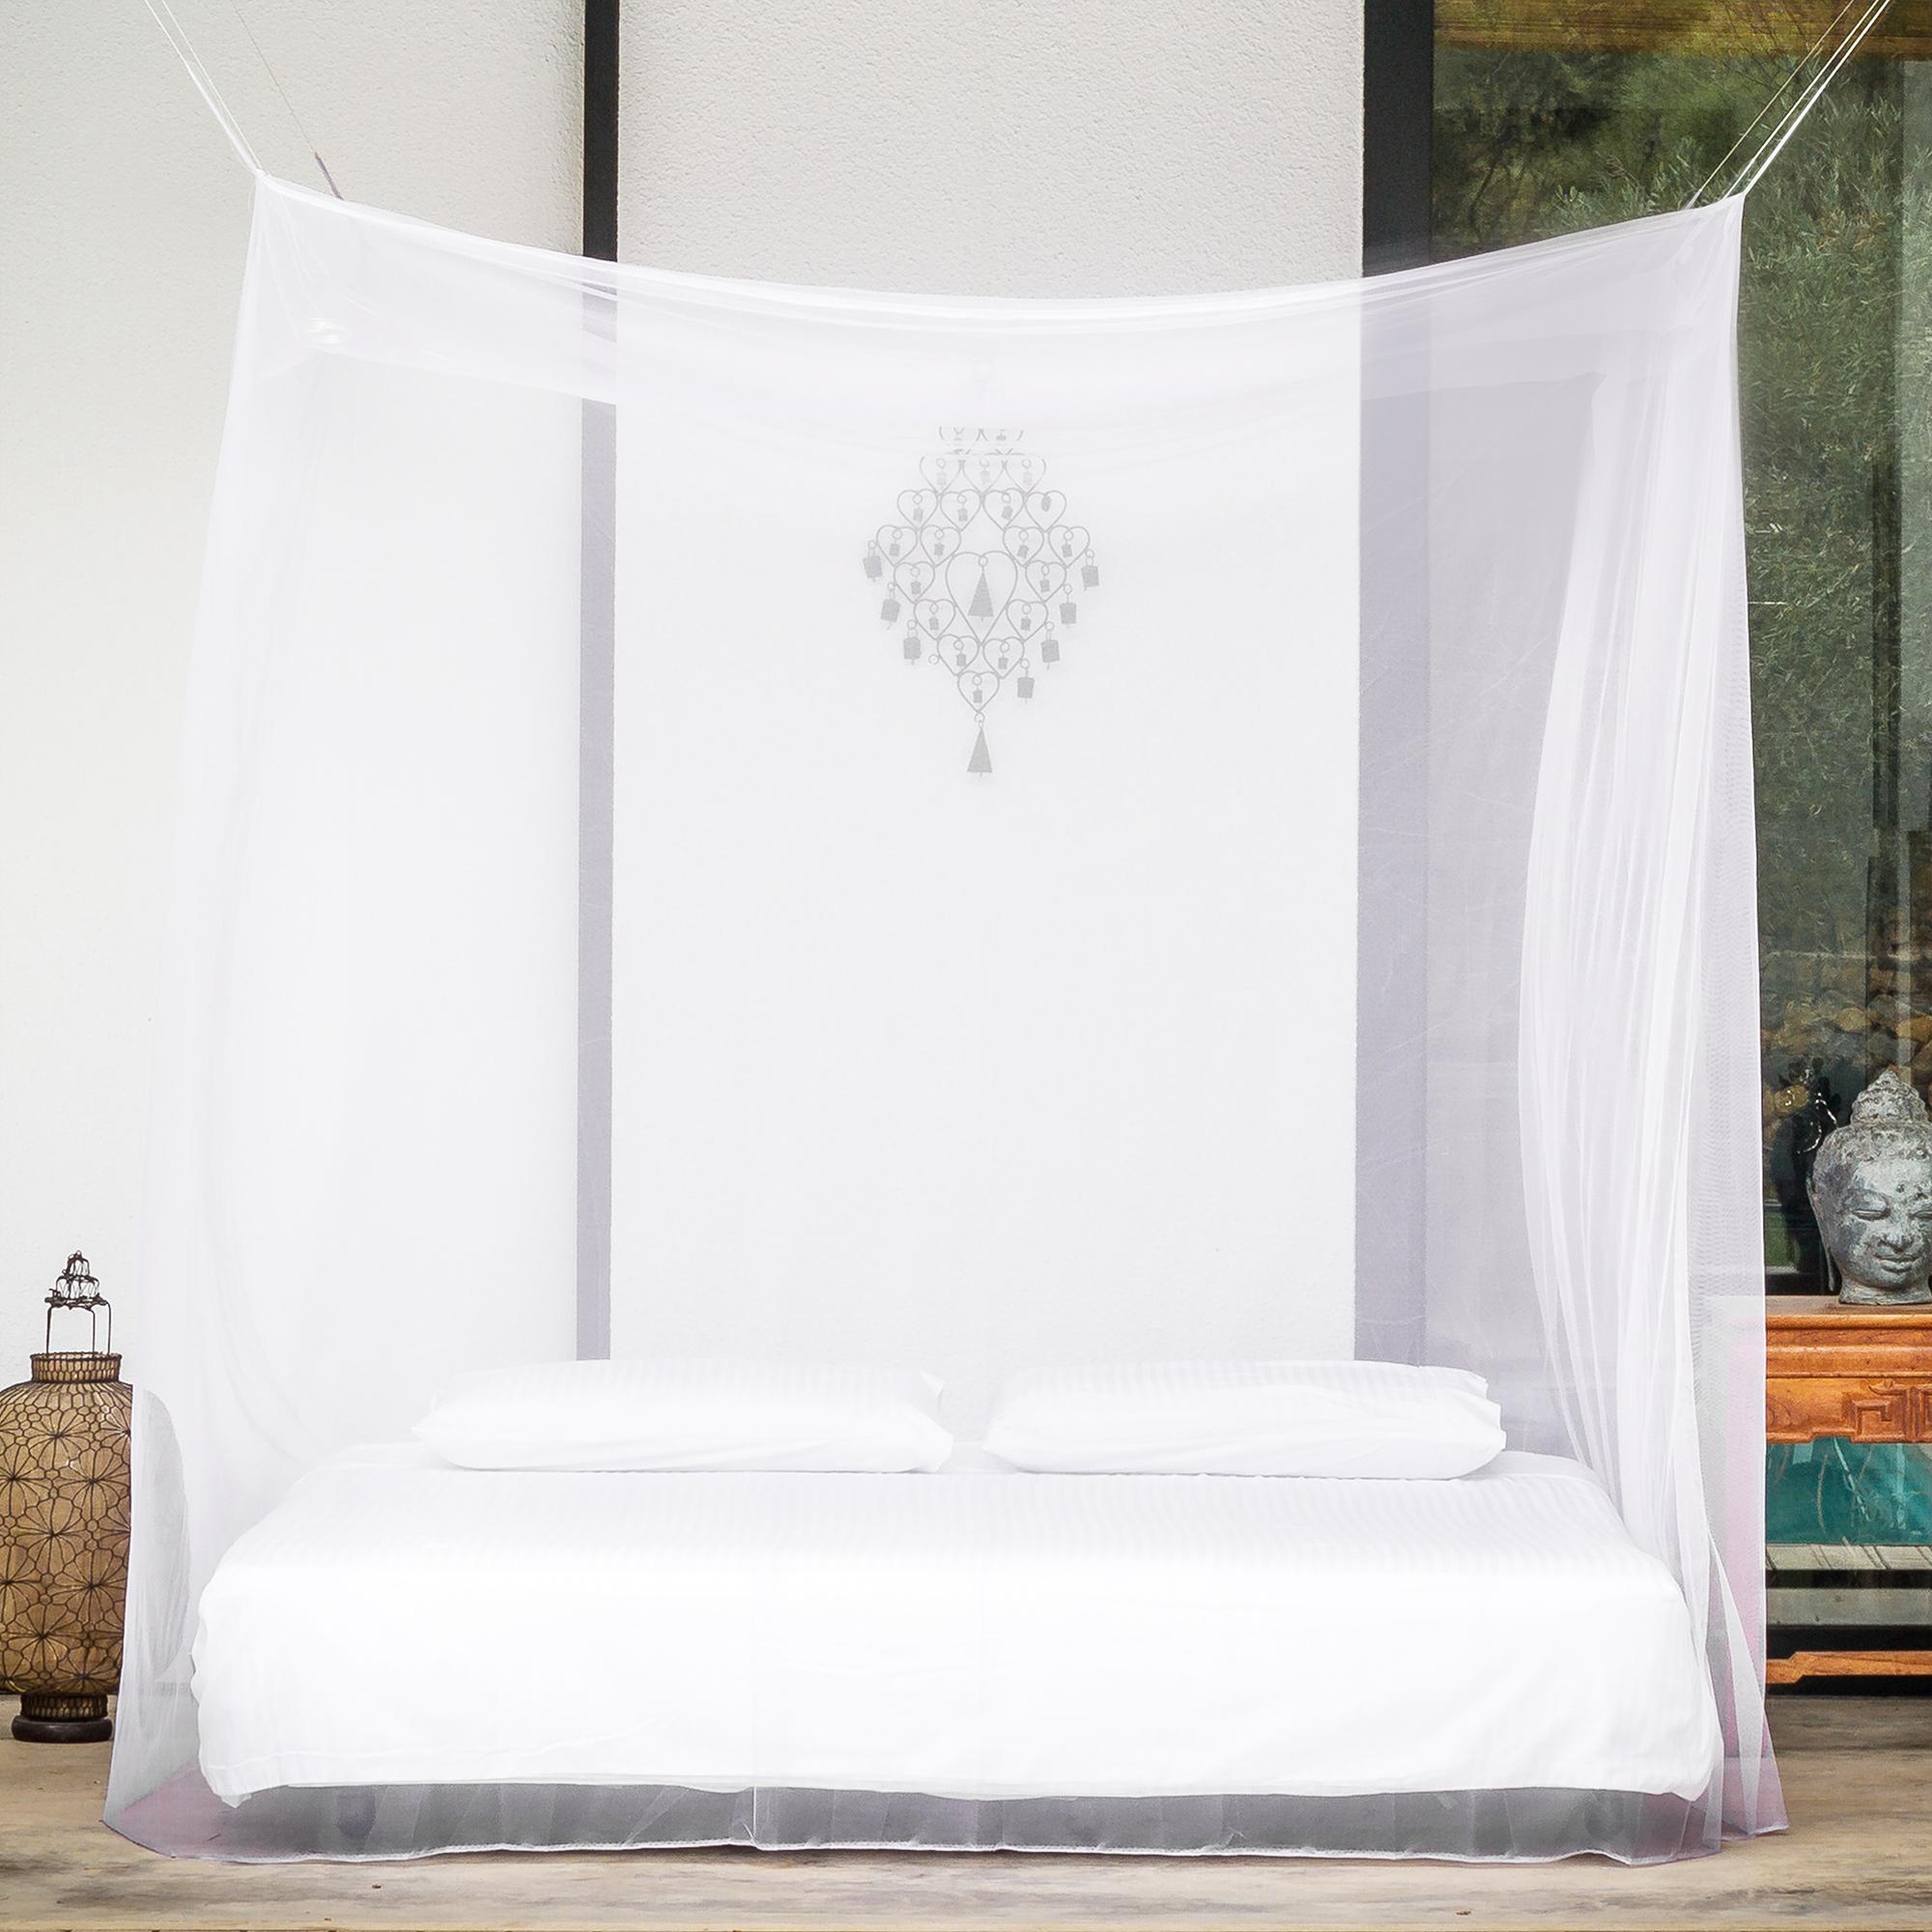 A Good Mosquito Net